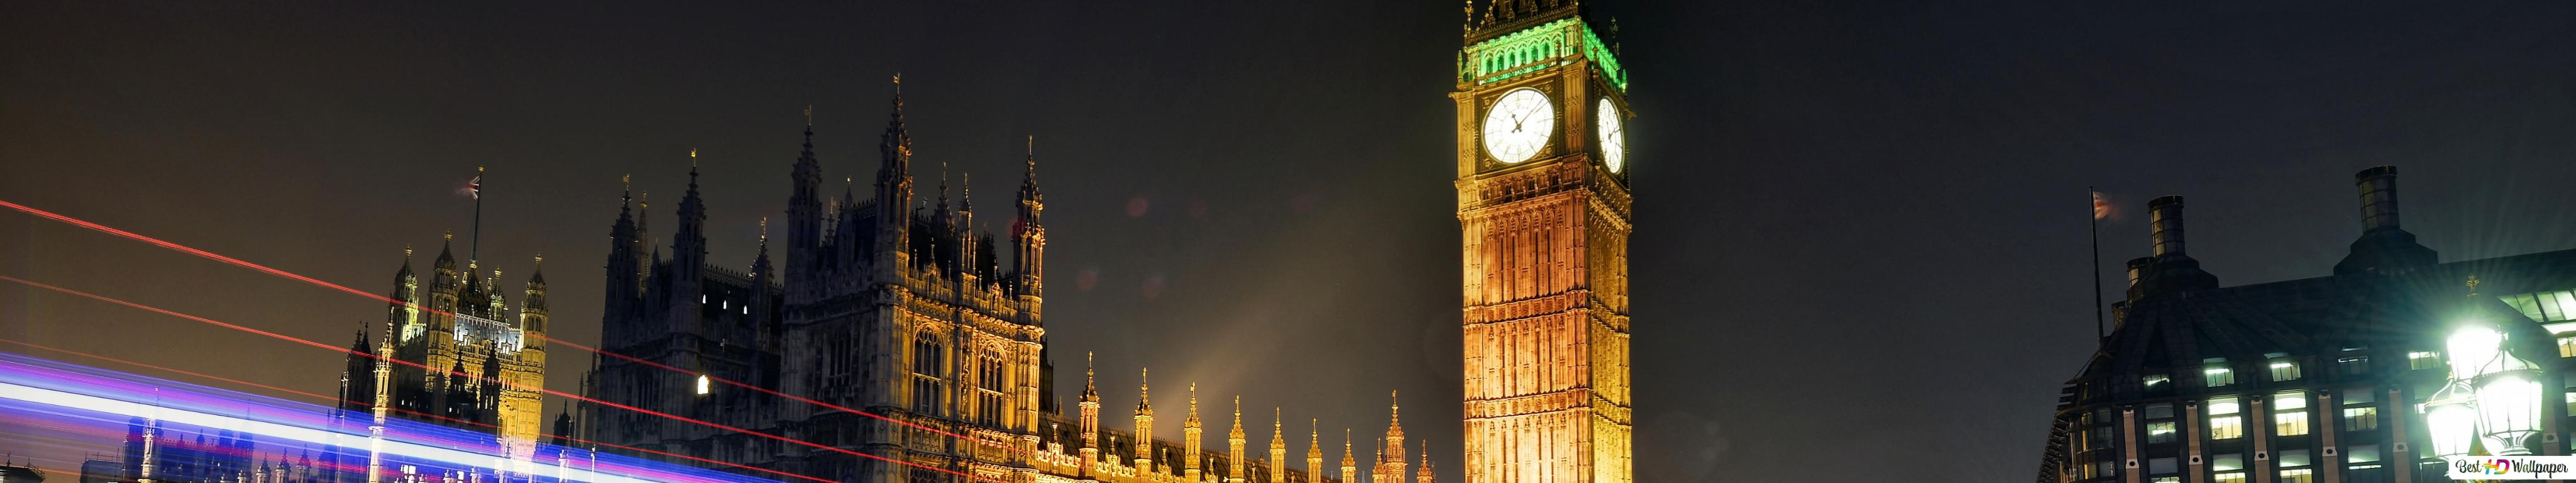 Big Ben In London Hd Wallpaper Download